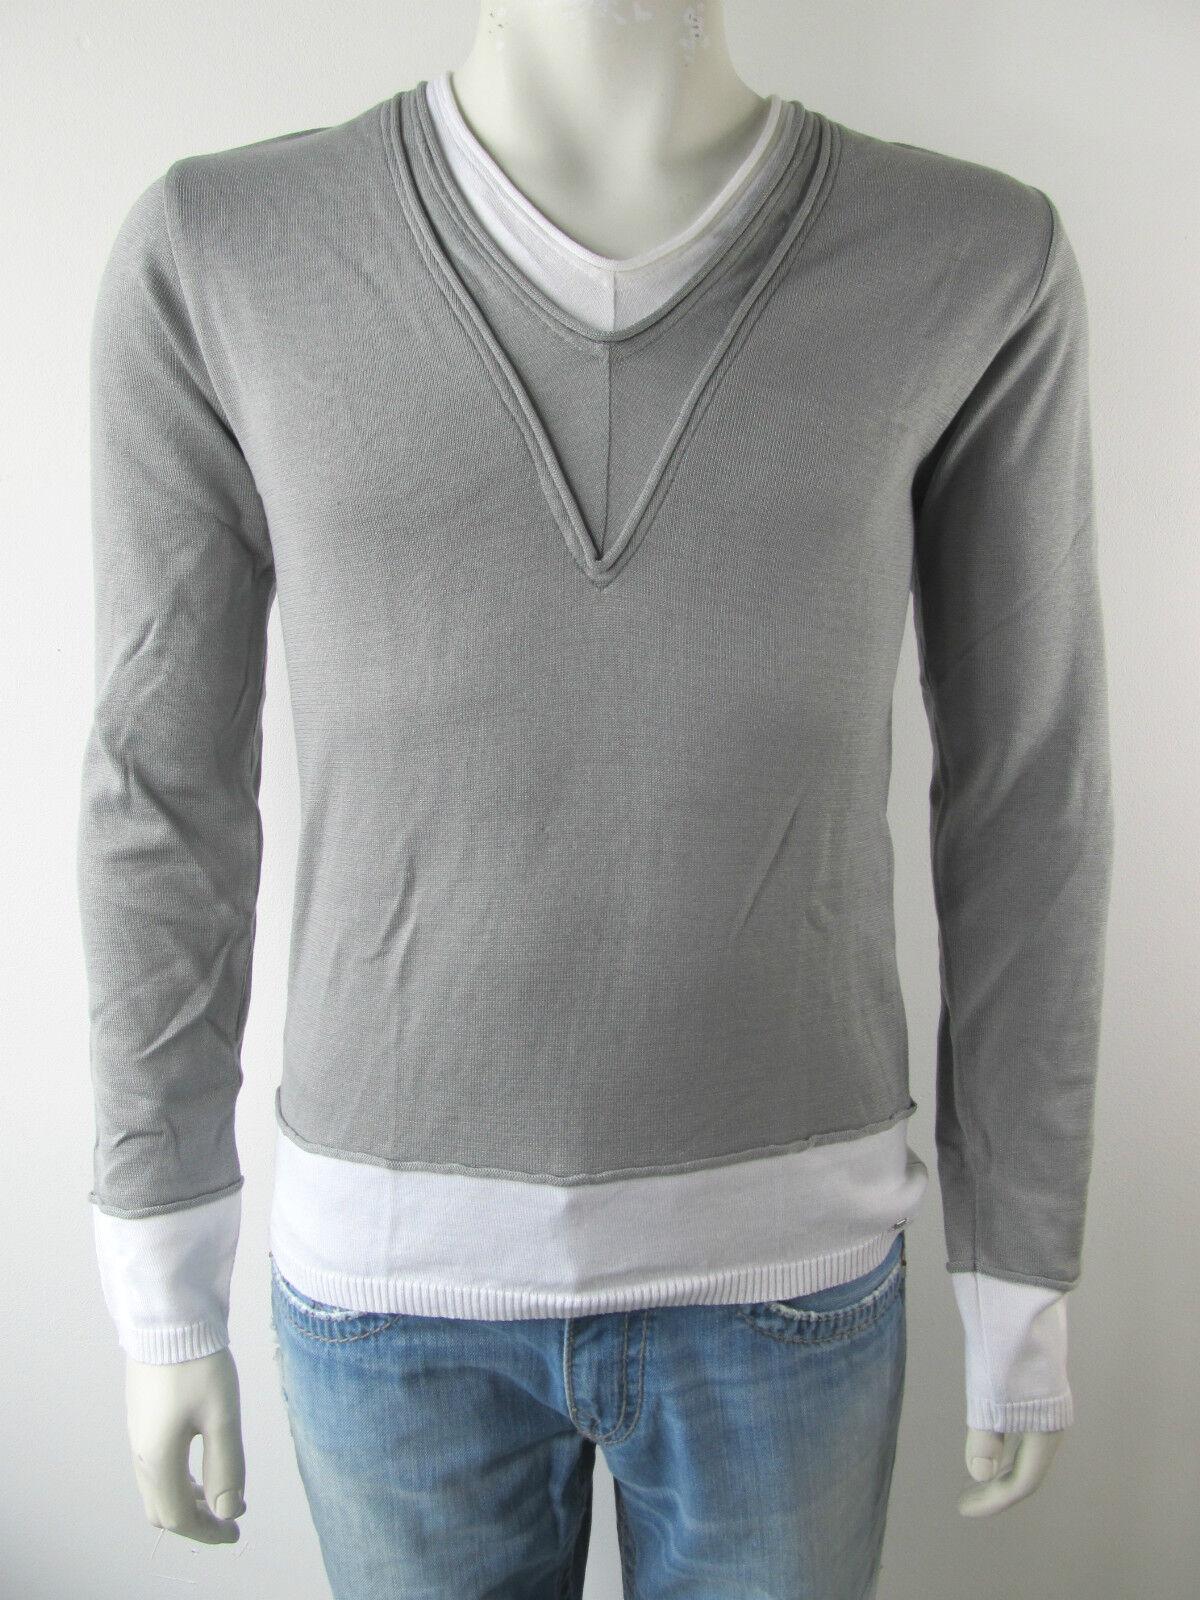 Bray Steve Alan Shirt Pull Pullover 2 in 1 Maglia 11R7026 Neu M